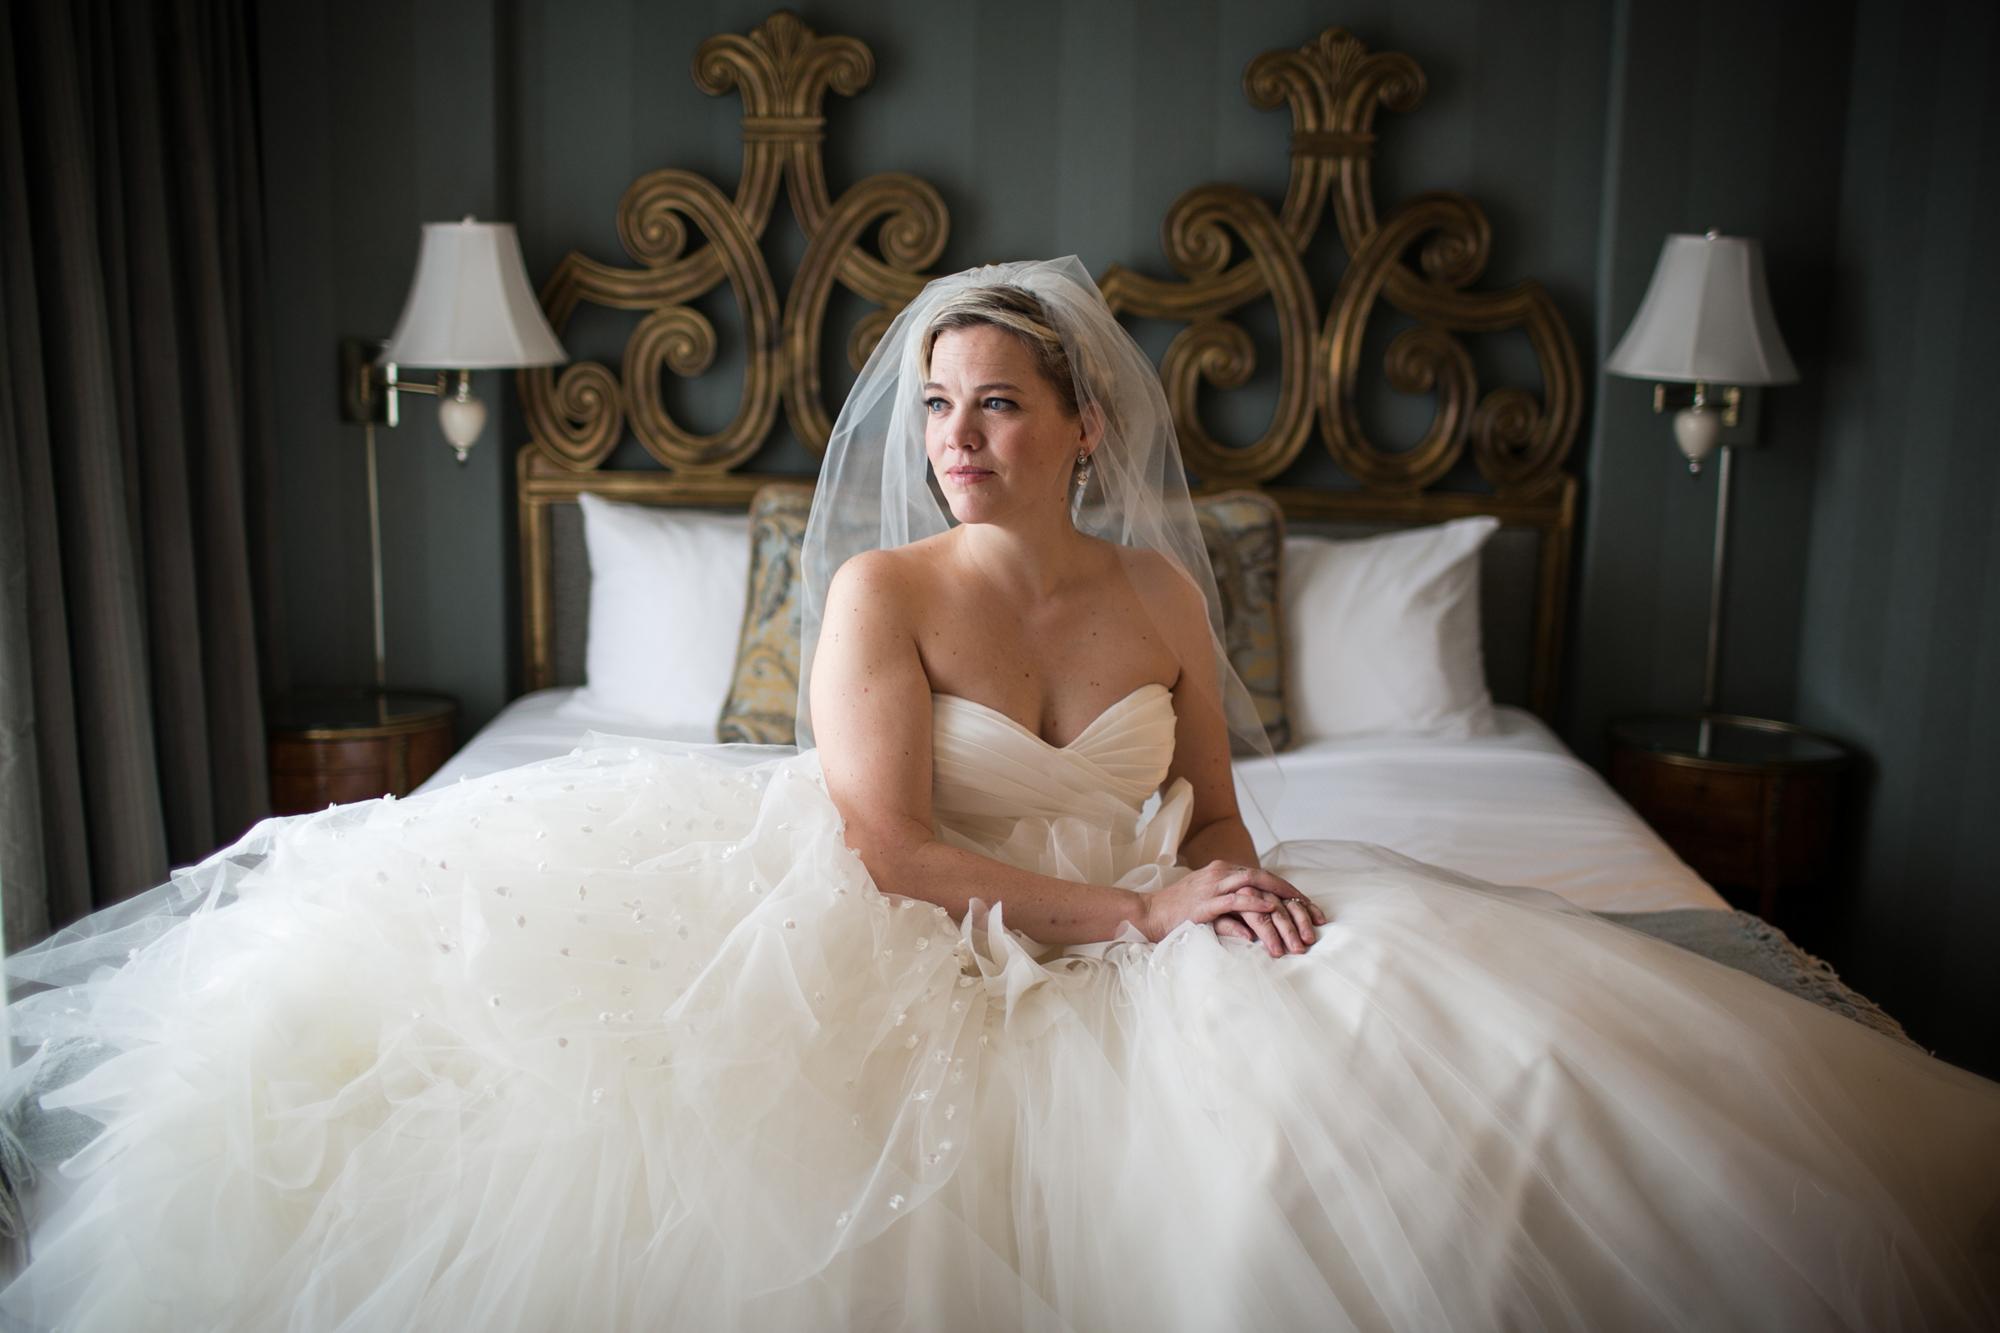 vancouver-luxury-wedding-photographer-lori-miles--3.jpg